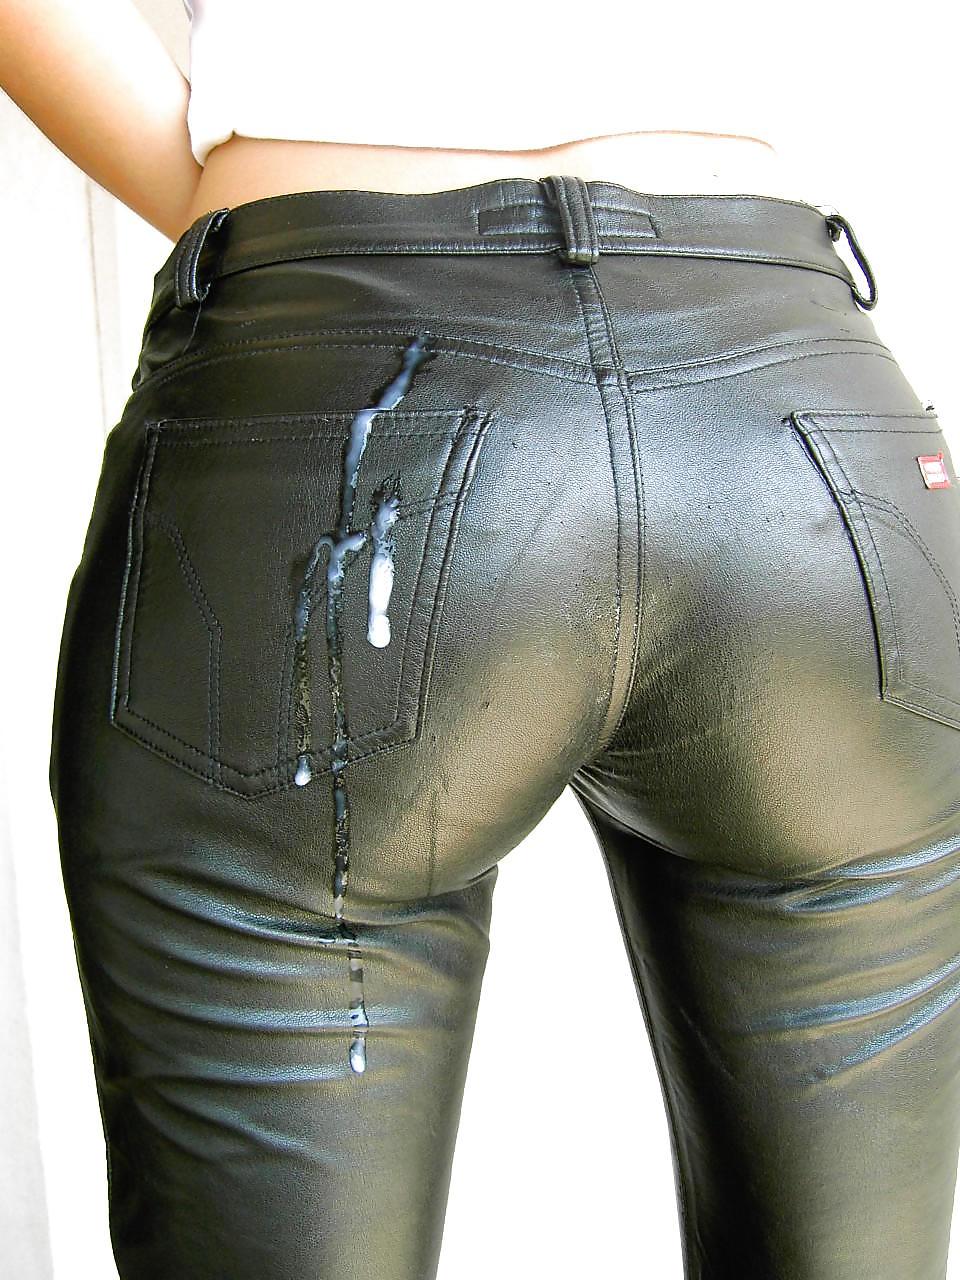 Cum leather pants, sexy spot feet